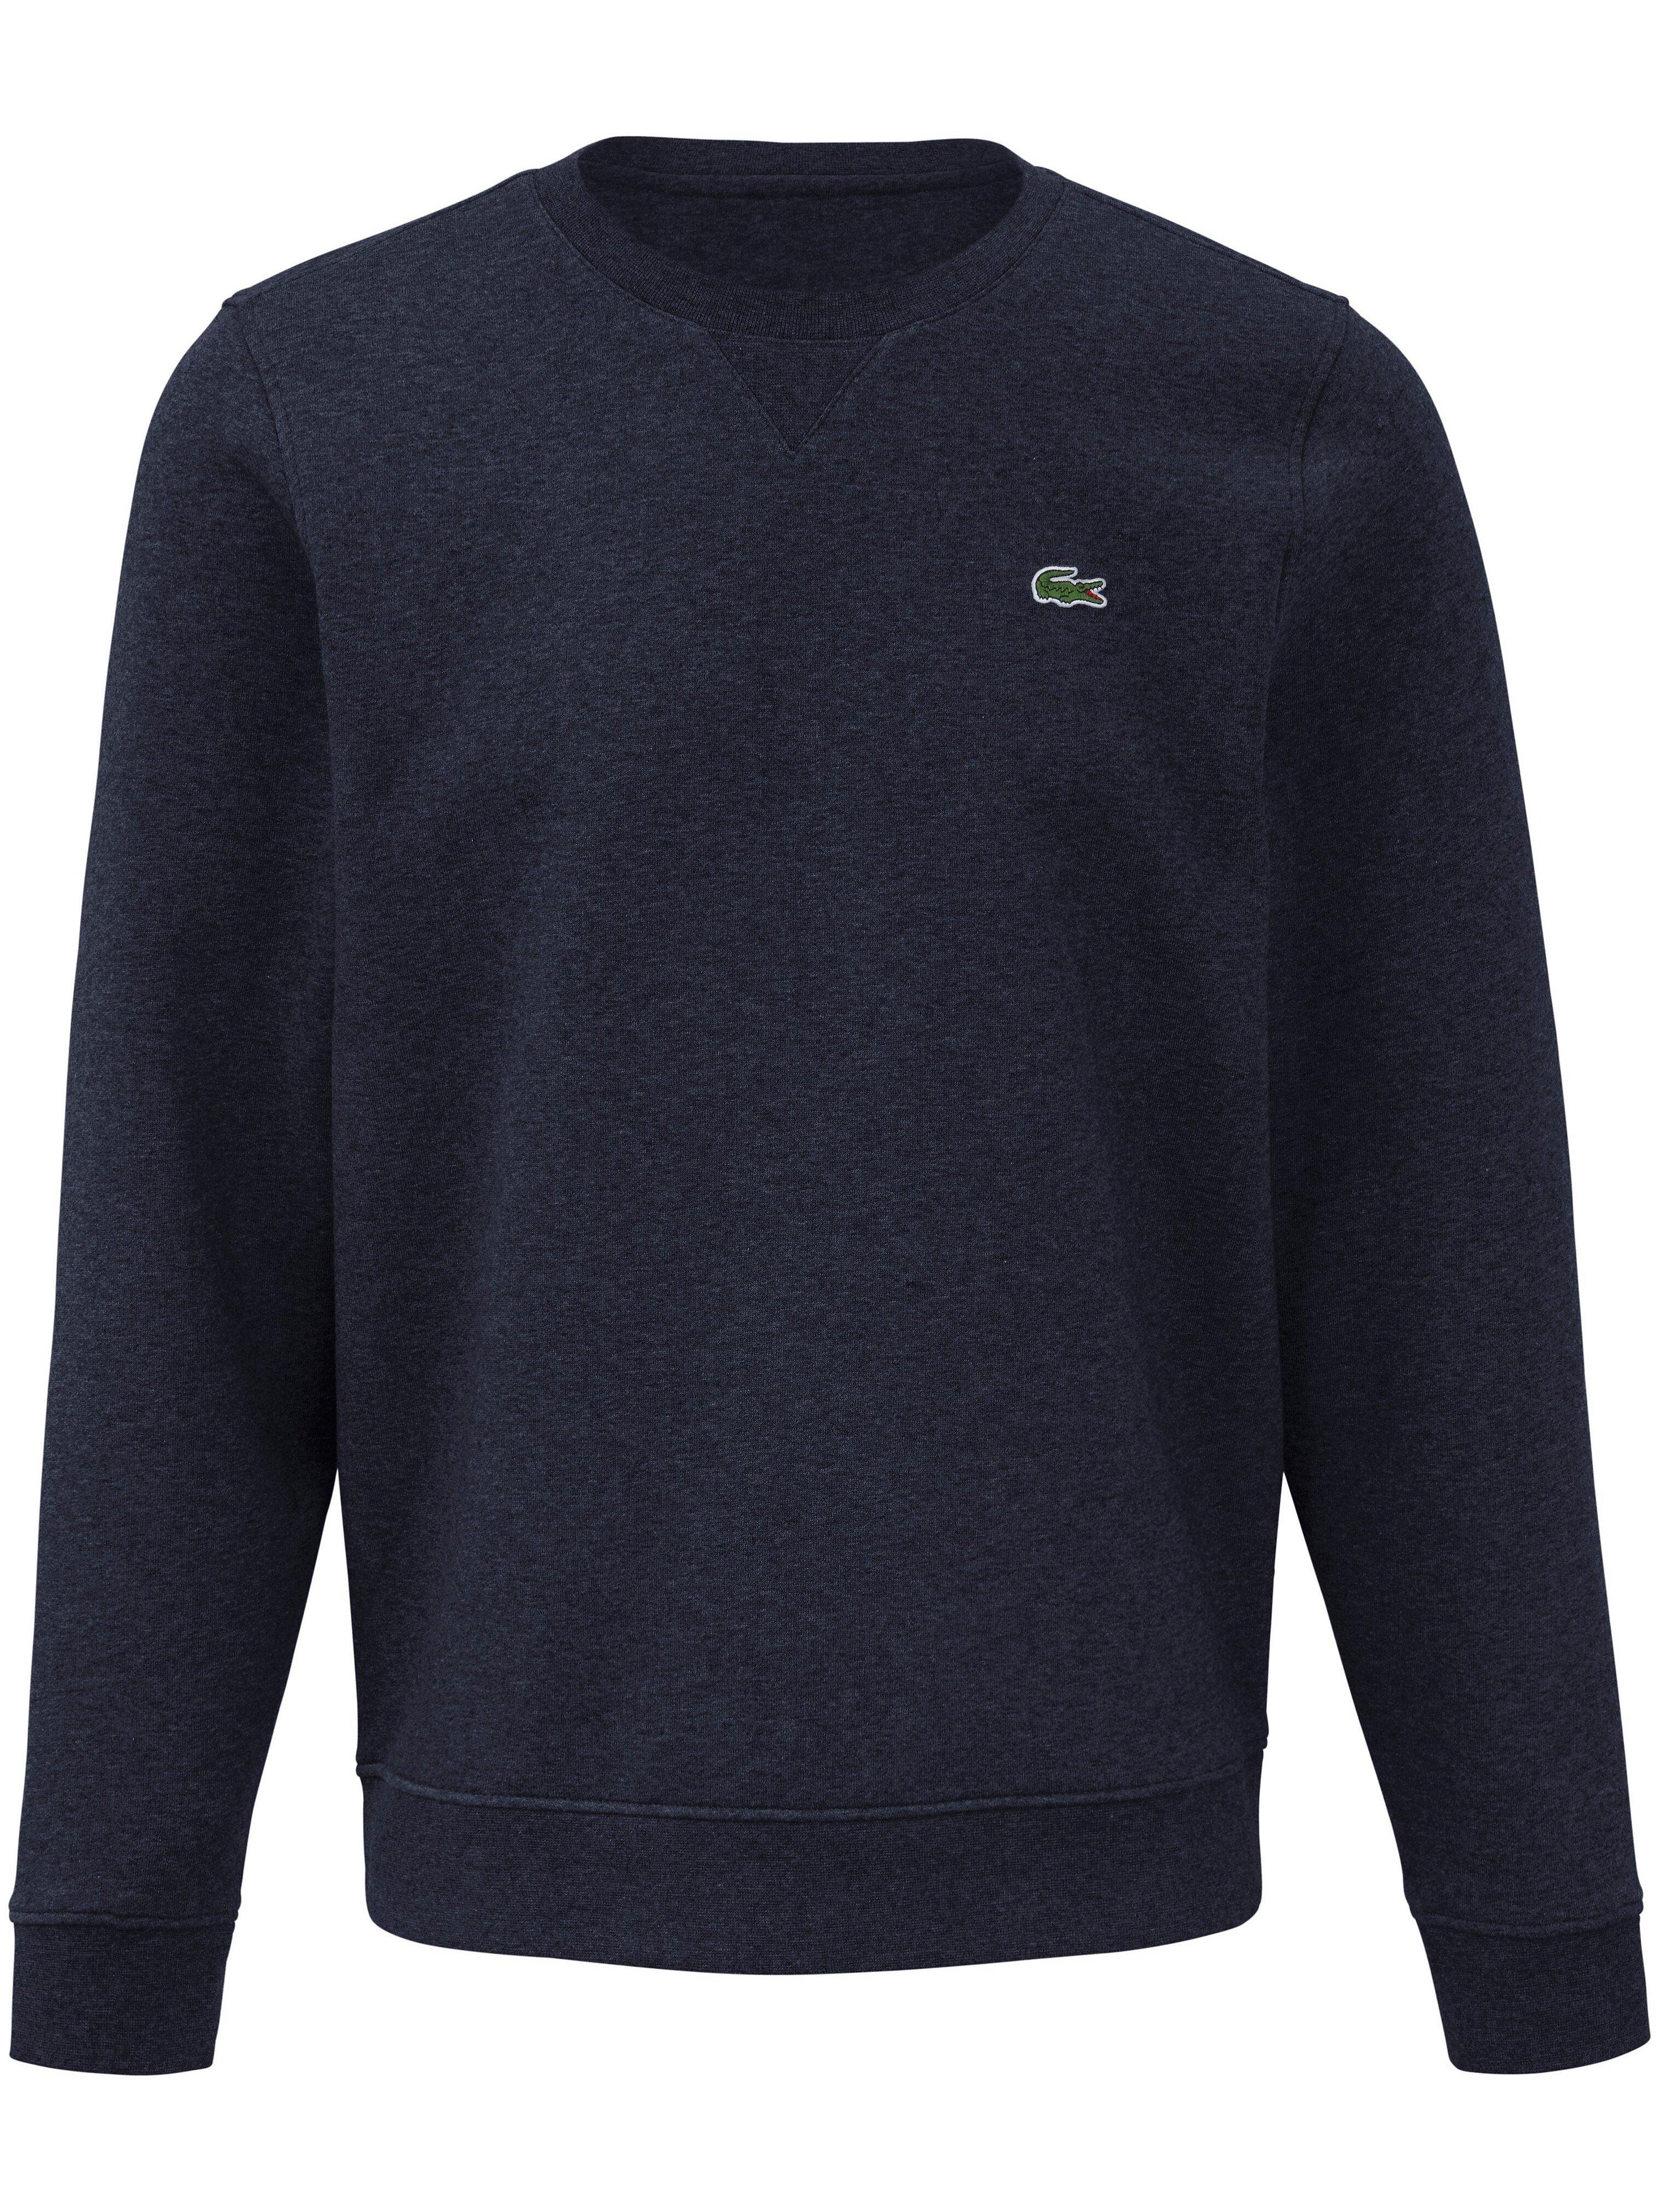 Sweatshirt Fra Lacoste blå